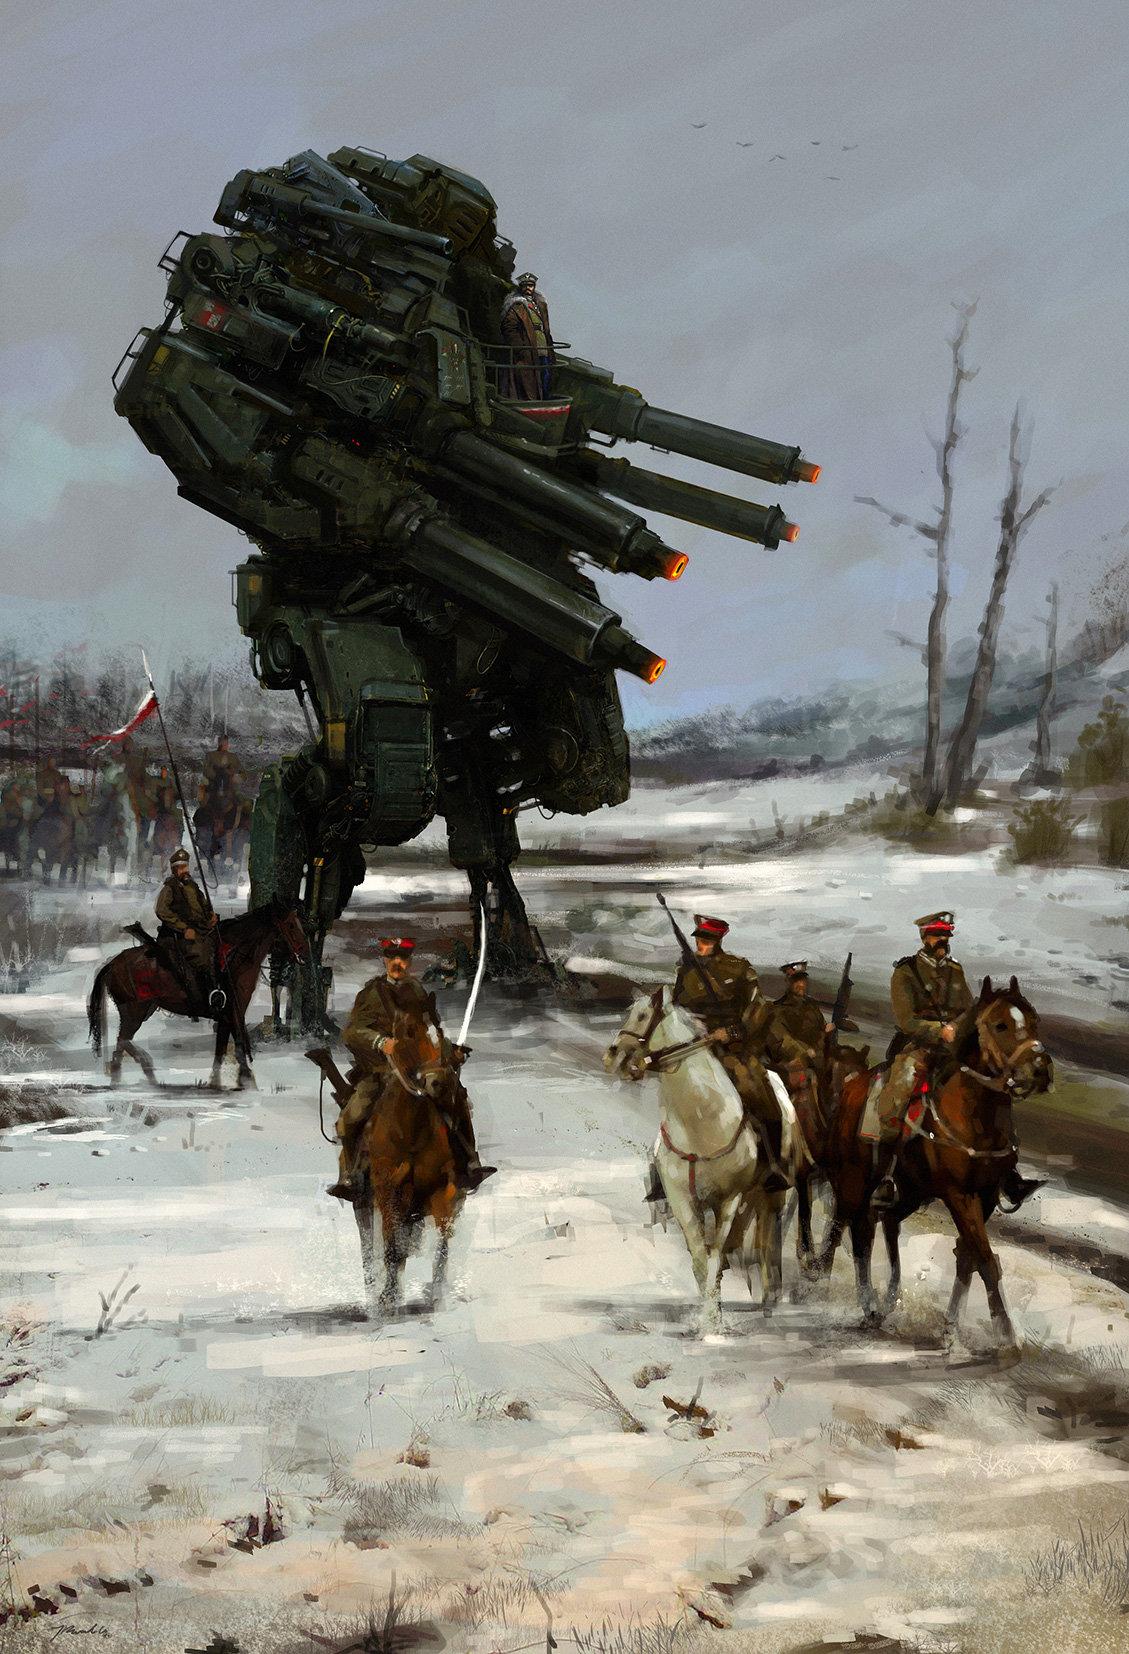 Jakub_Rozalski_-_1920 Warlord